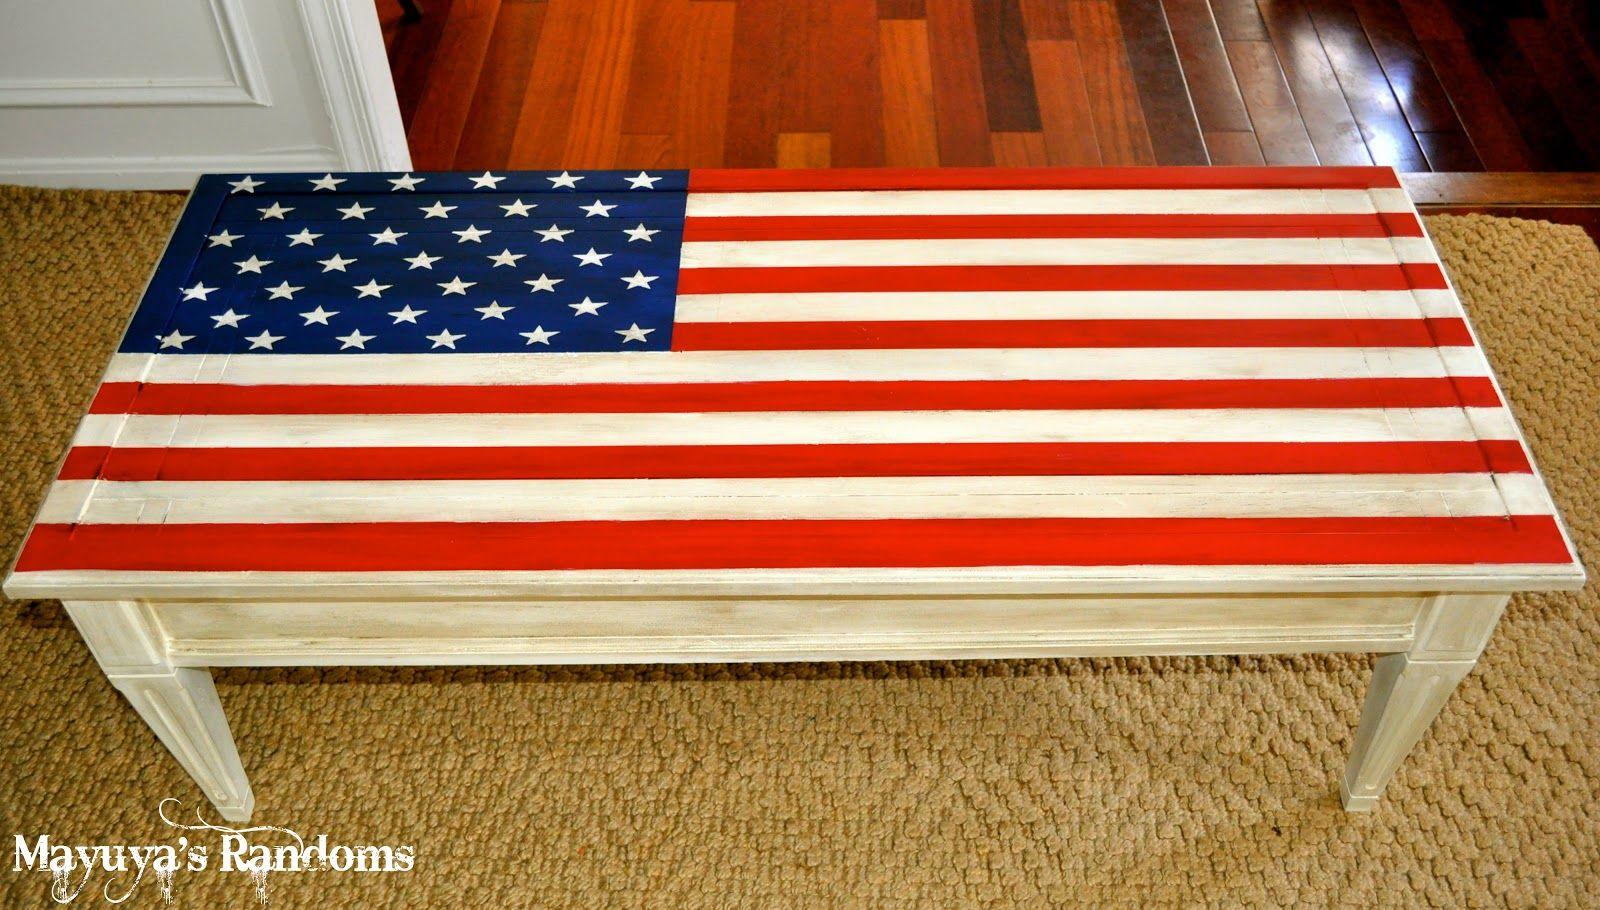 Mayuya's Randoms: American Flag Coffee Table